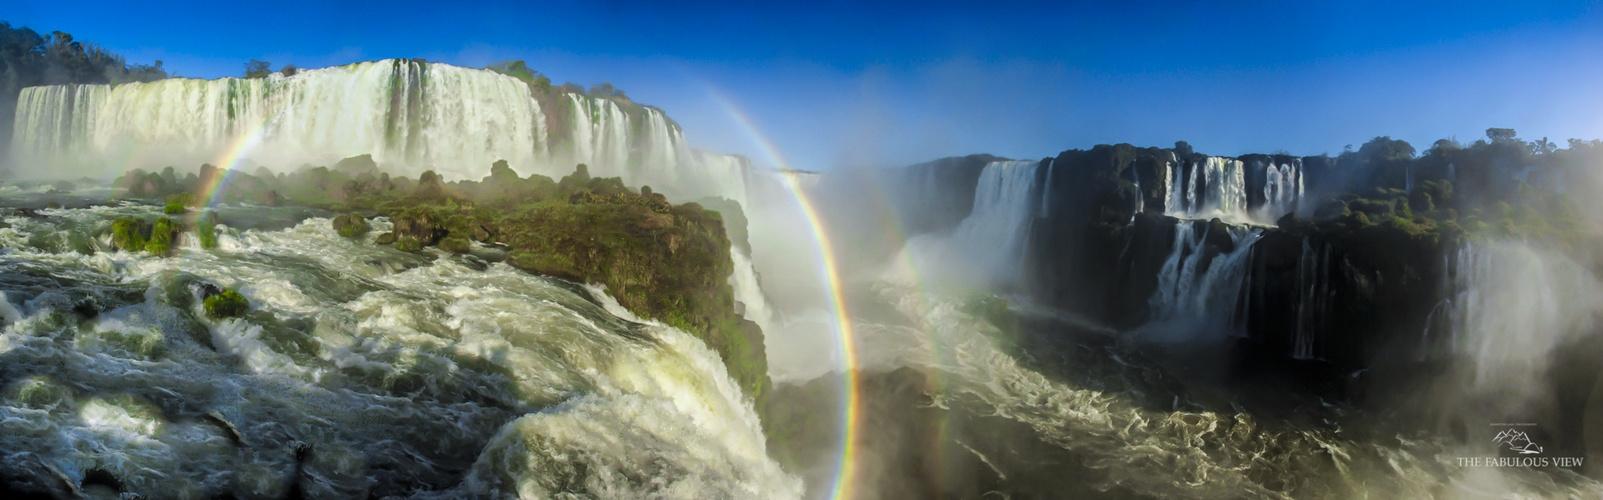 Where Brazil meets Argentina